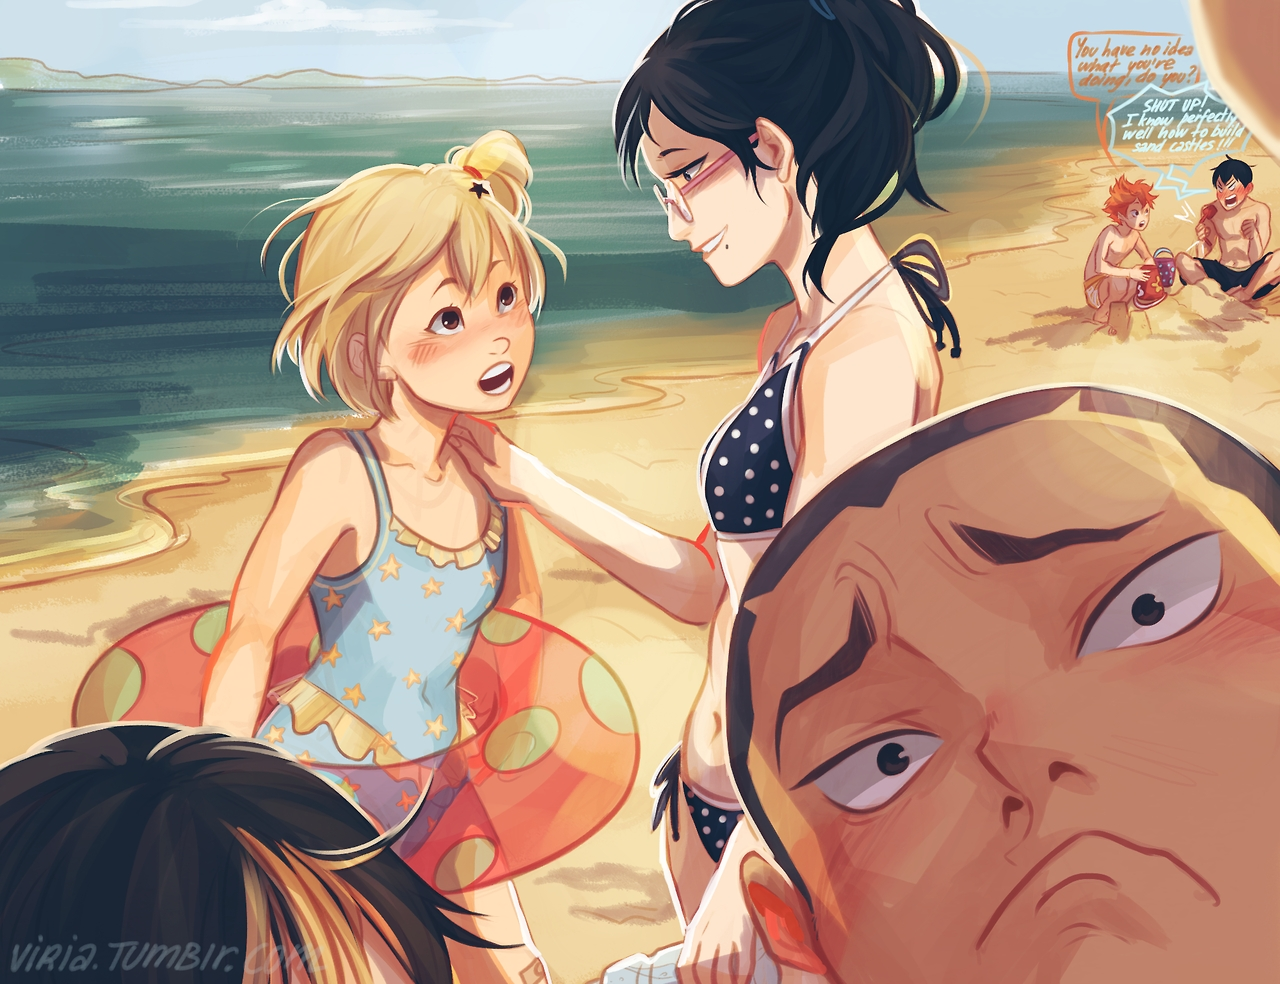 Haikyuu!! Image #1764303 - Zerochan Anime Image Board